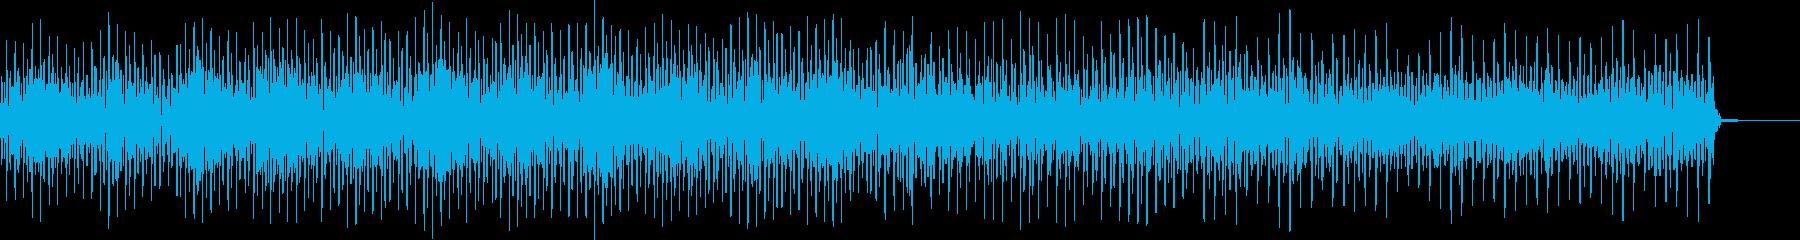 AMGアナログFX 24の再生済みの波形